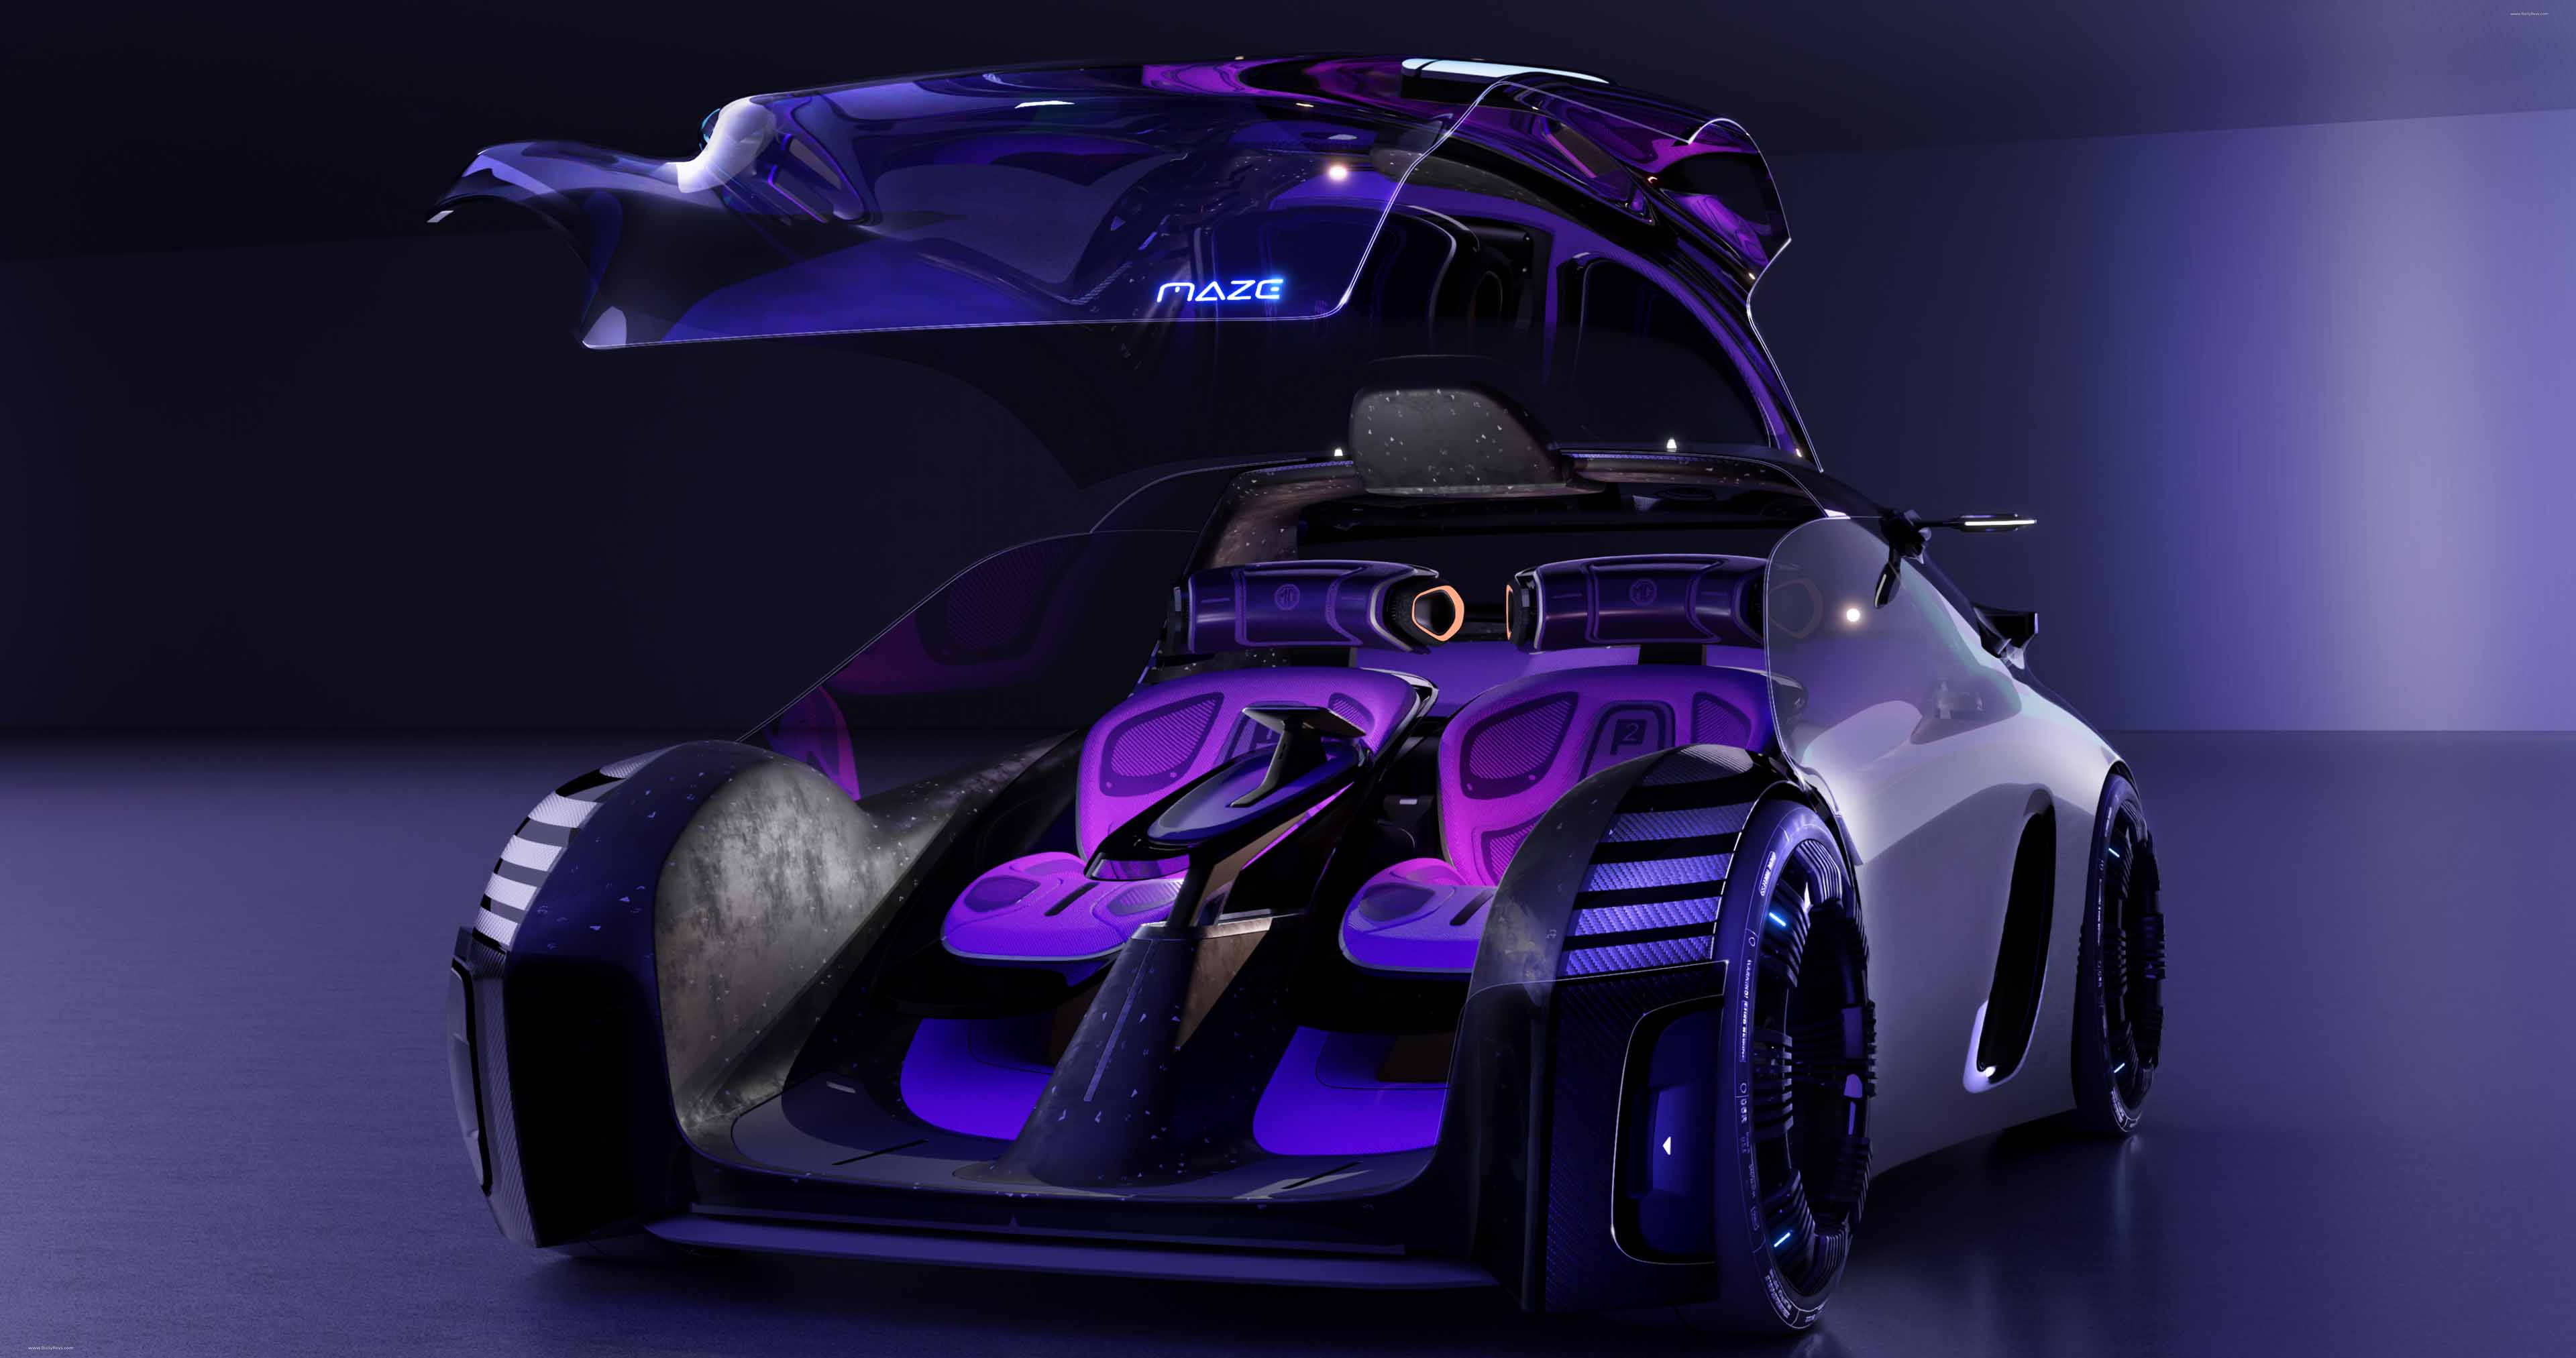 2021 MG MAZE Concept full